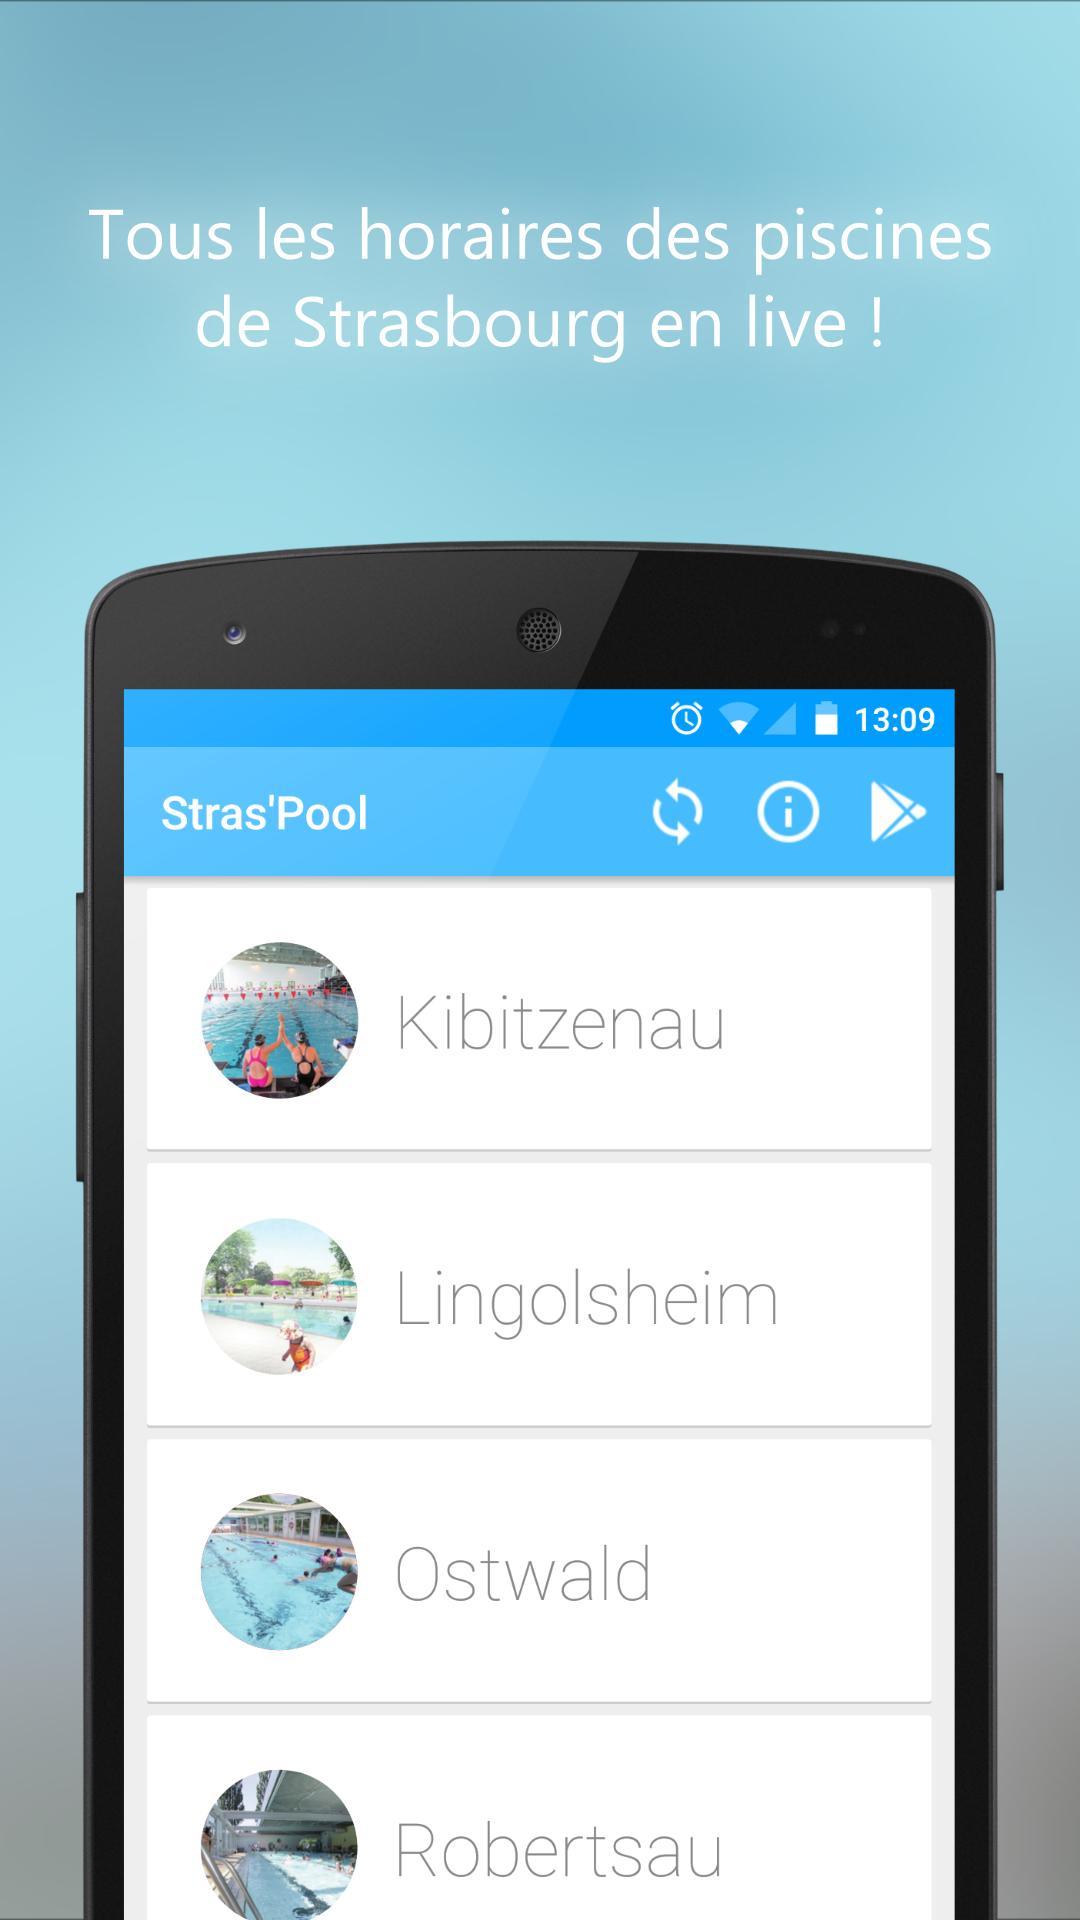 Stras'pool (Horaires Piscines) For Android - Apk Download encequiconcerne Piscine Lingolsheim Horaires